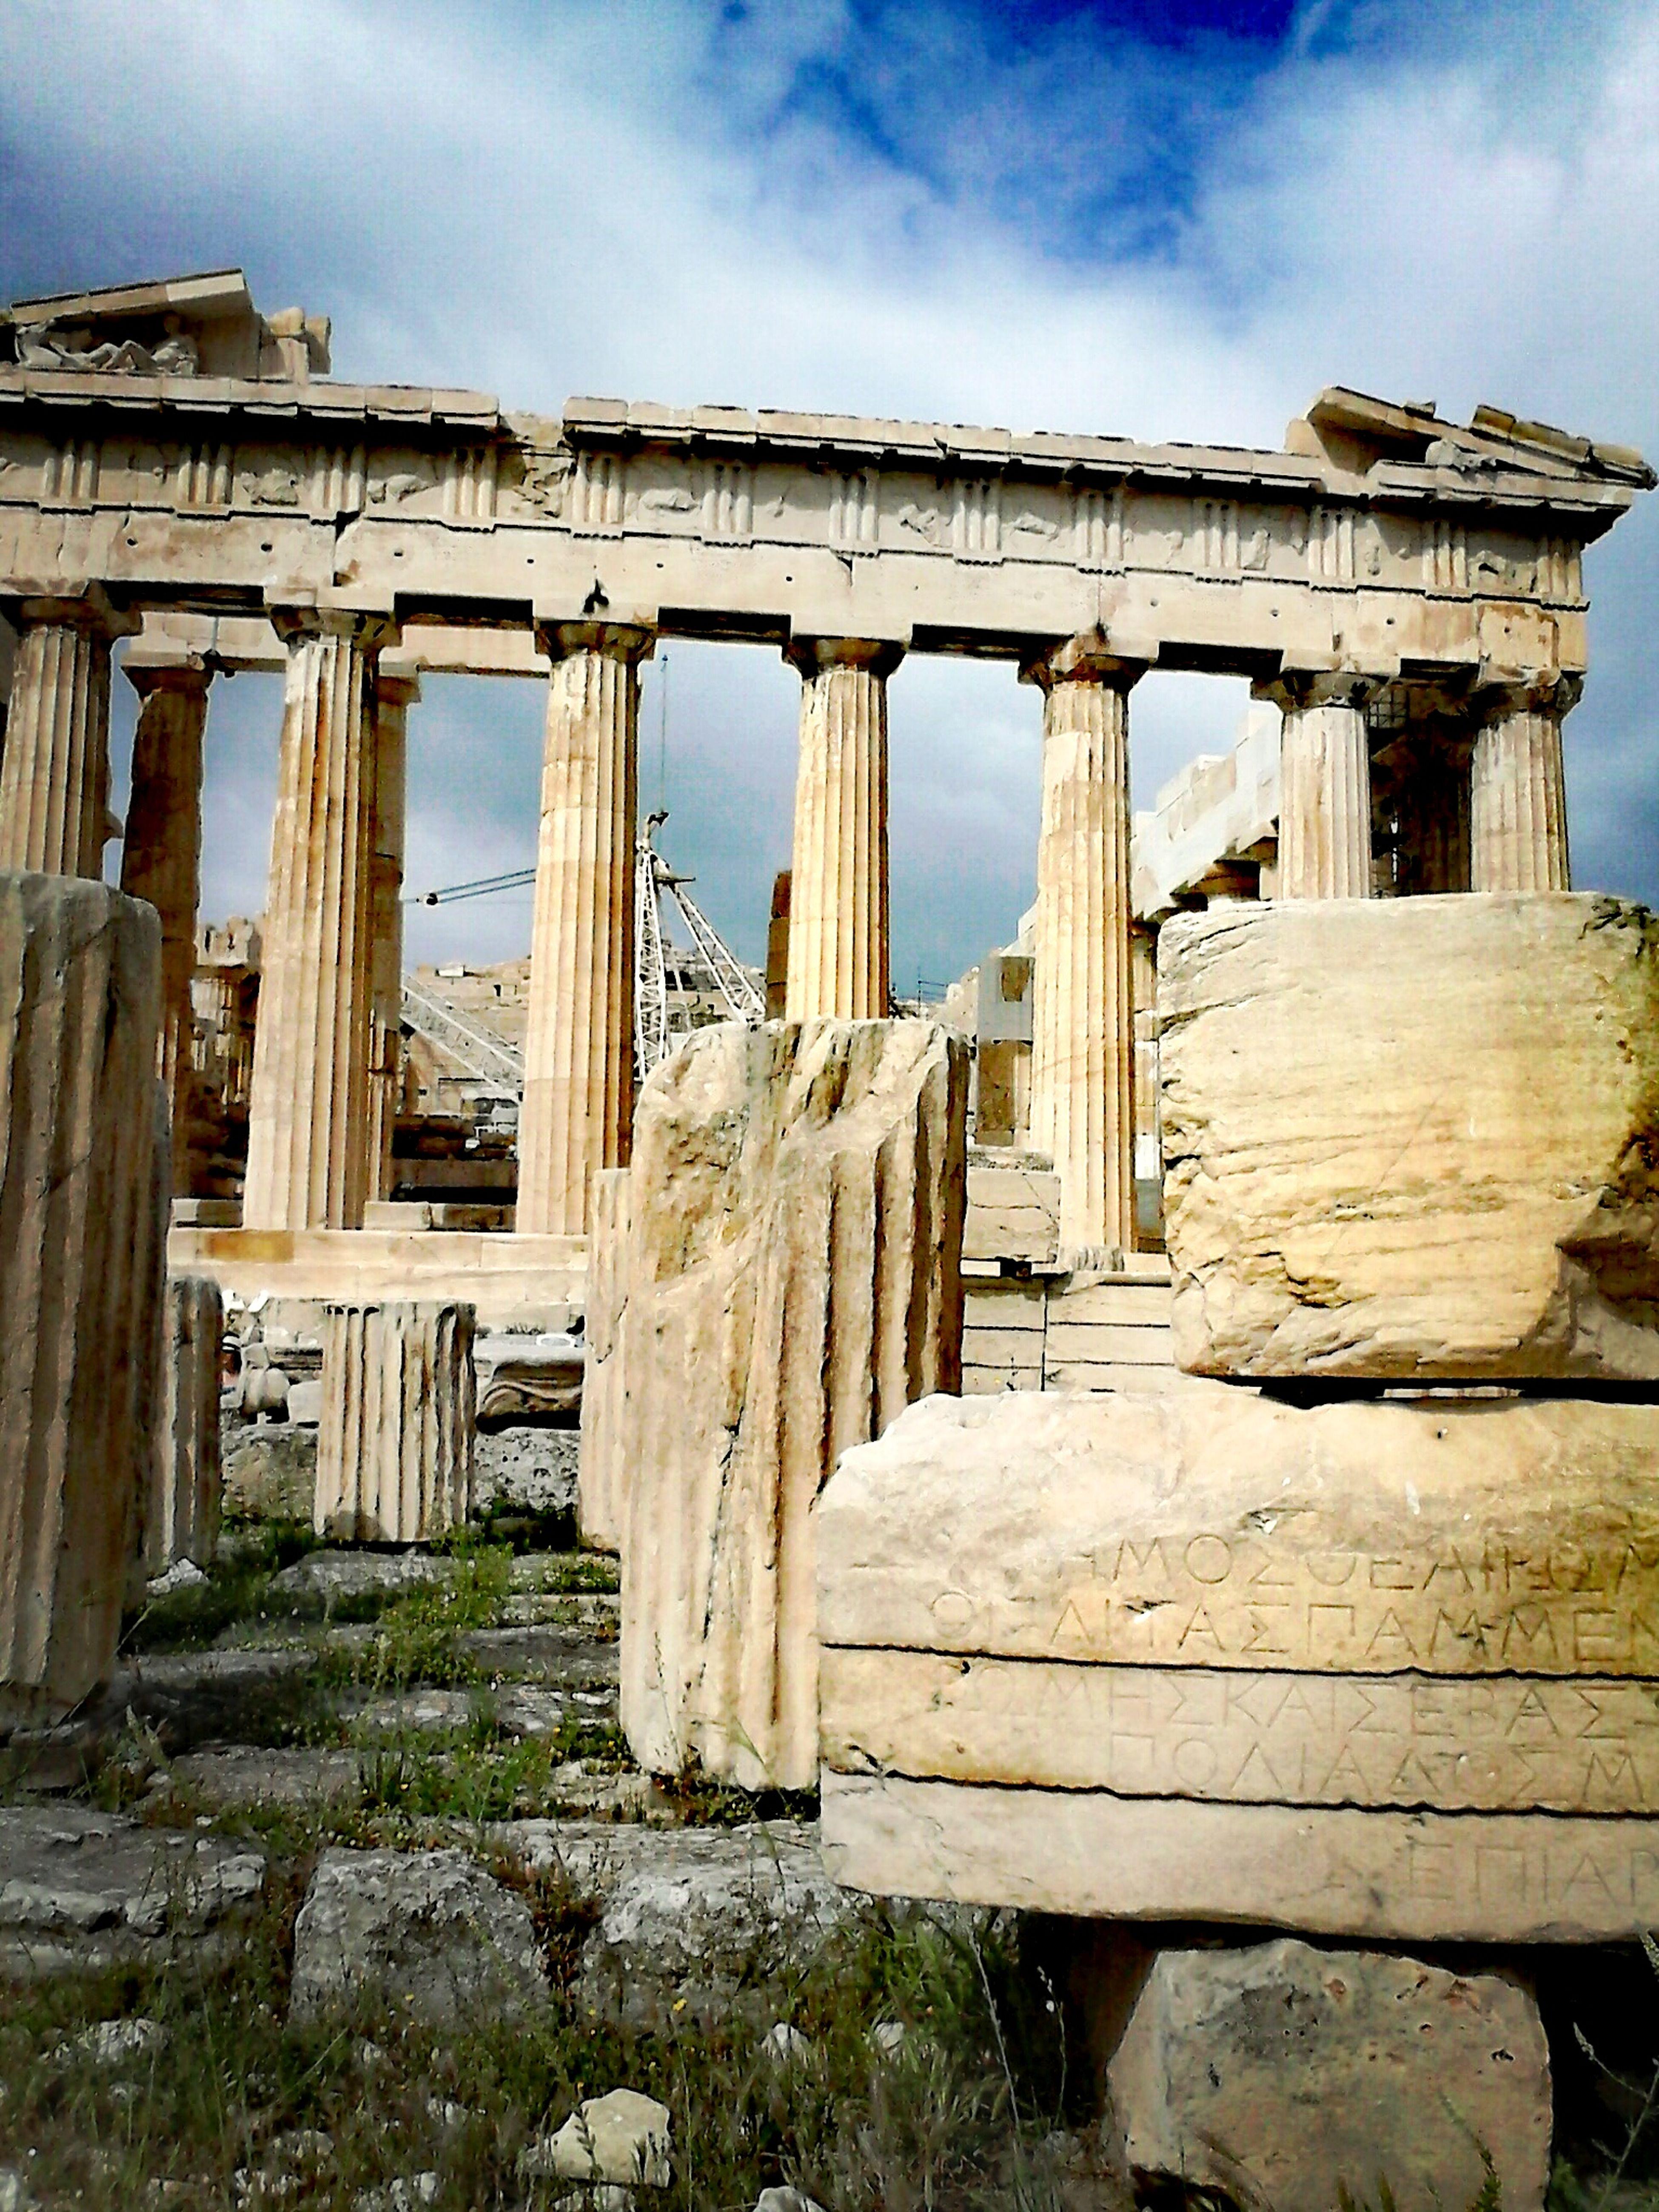 Tourism Vacations Famous Place Parthenon Temple Athenas Temple Grecce Parthenon Greece 7 Maravilla